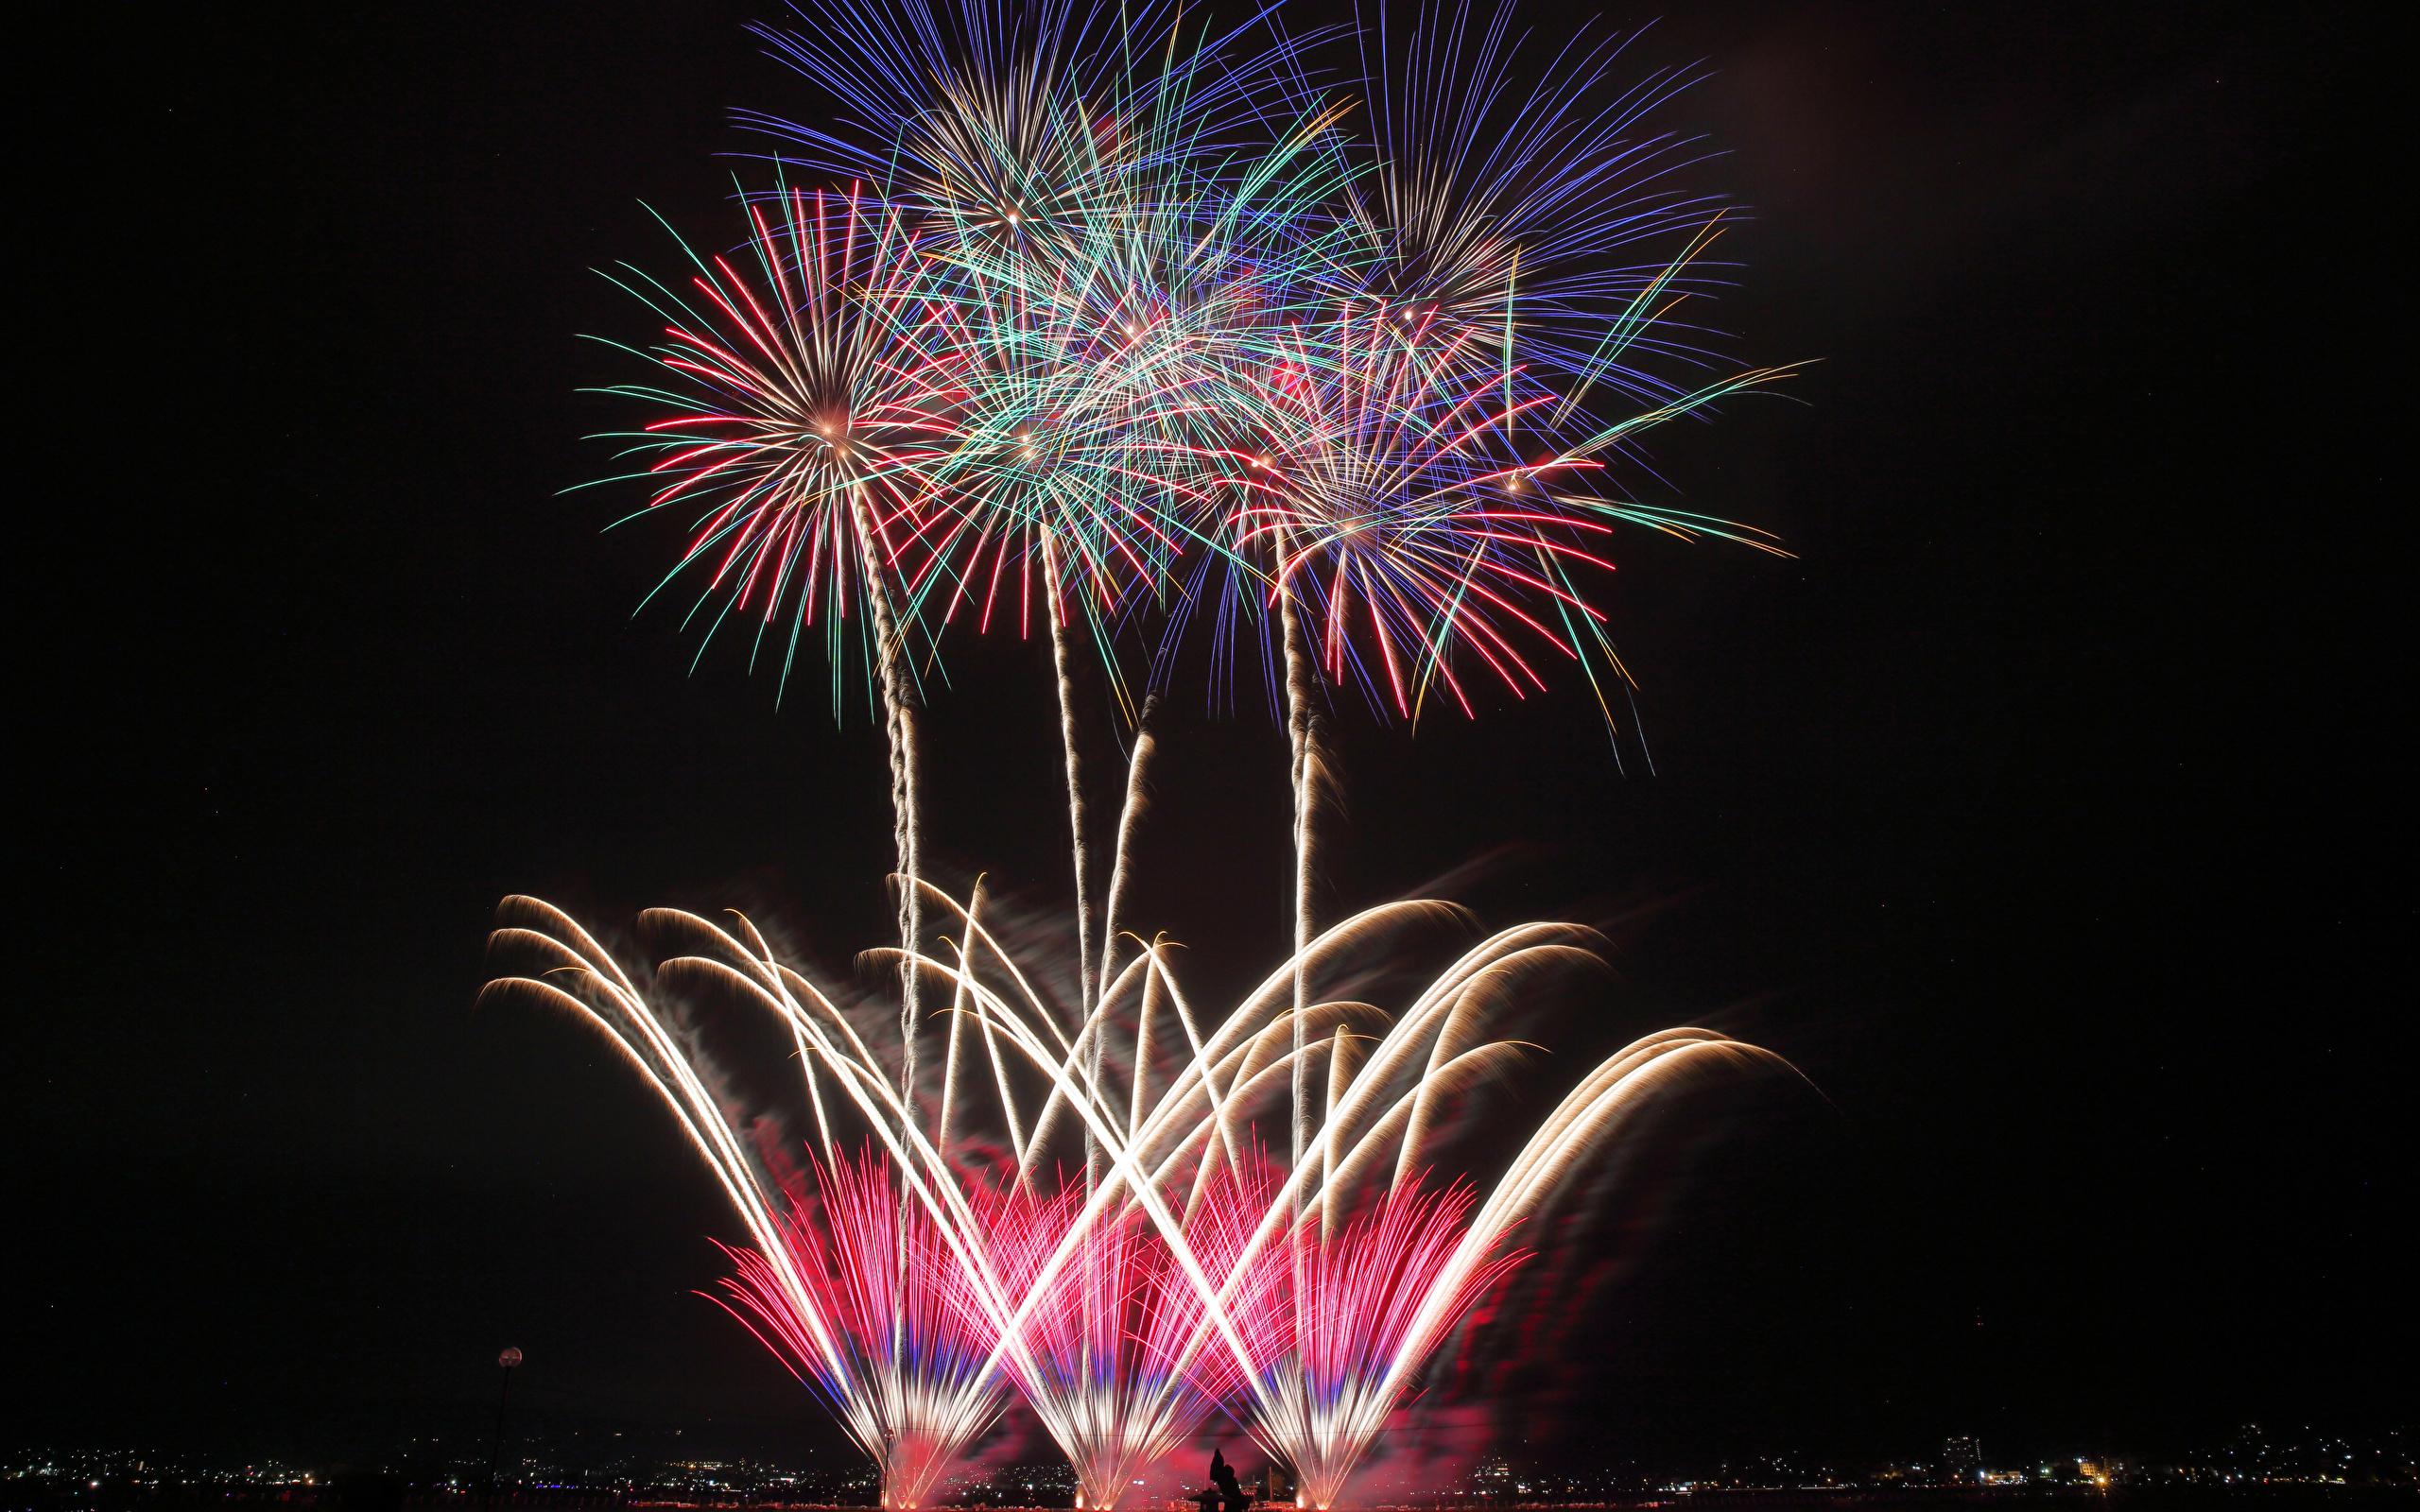 Fireworks_Night_497961_2560x1600